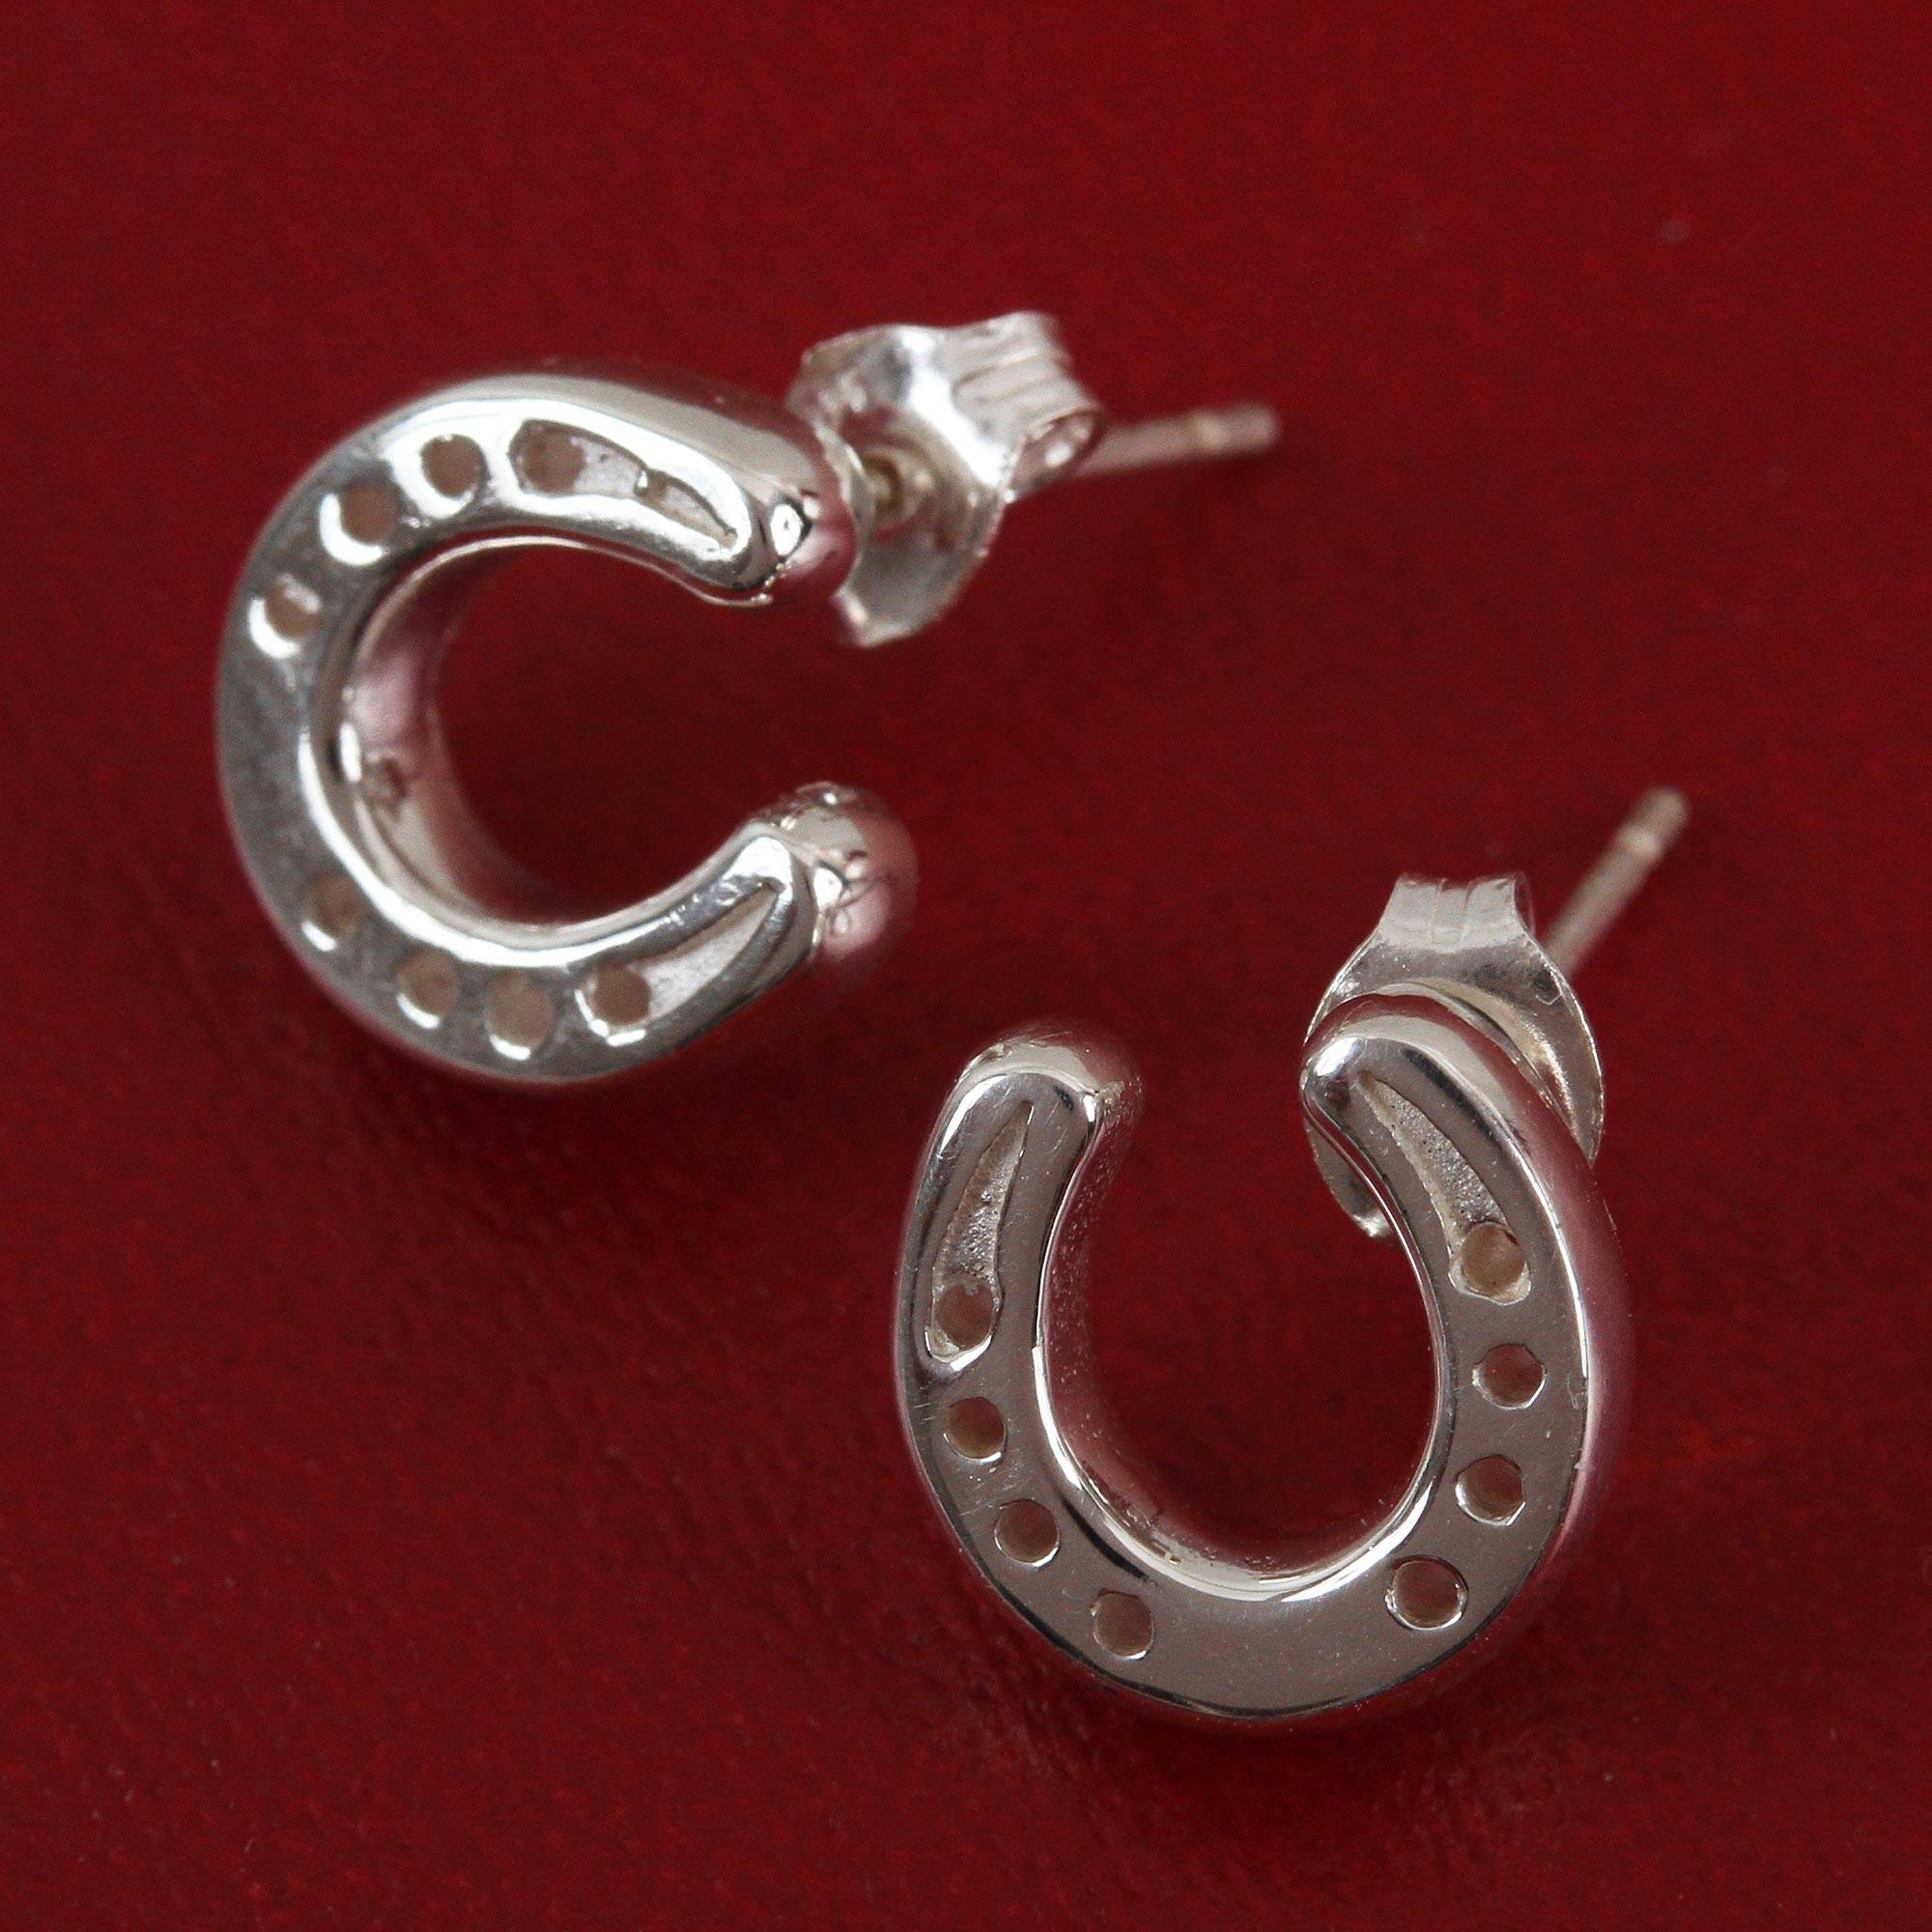 NOVICA .925 Sterling Silver Ear Cuff Horseshoe Luck